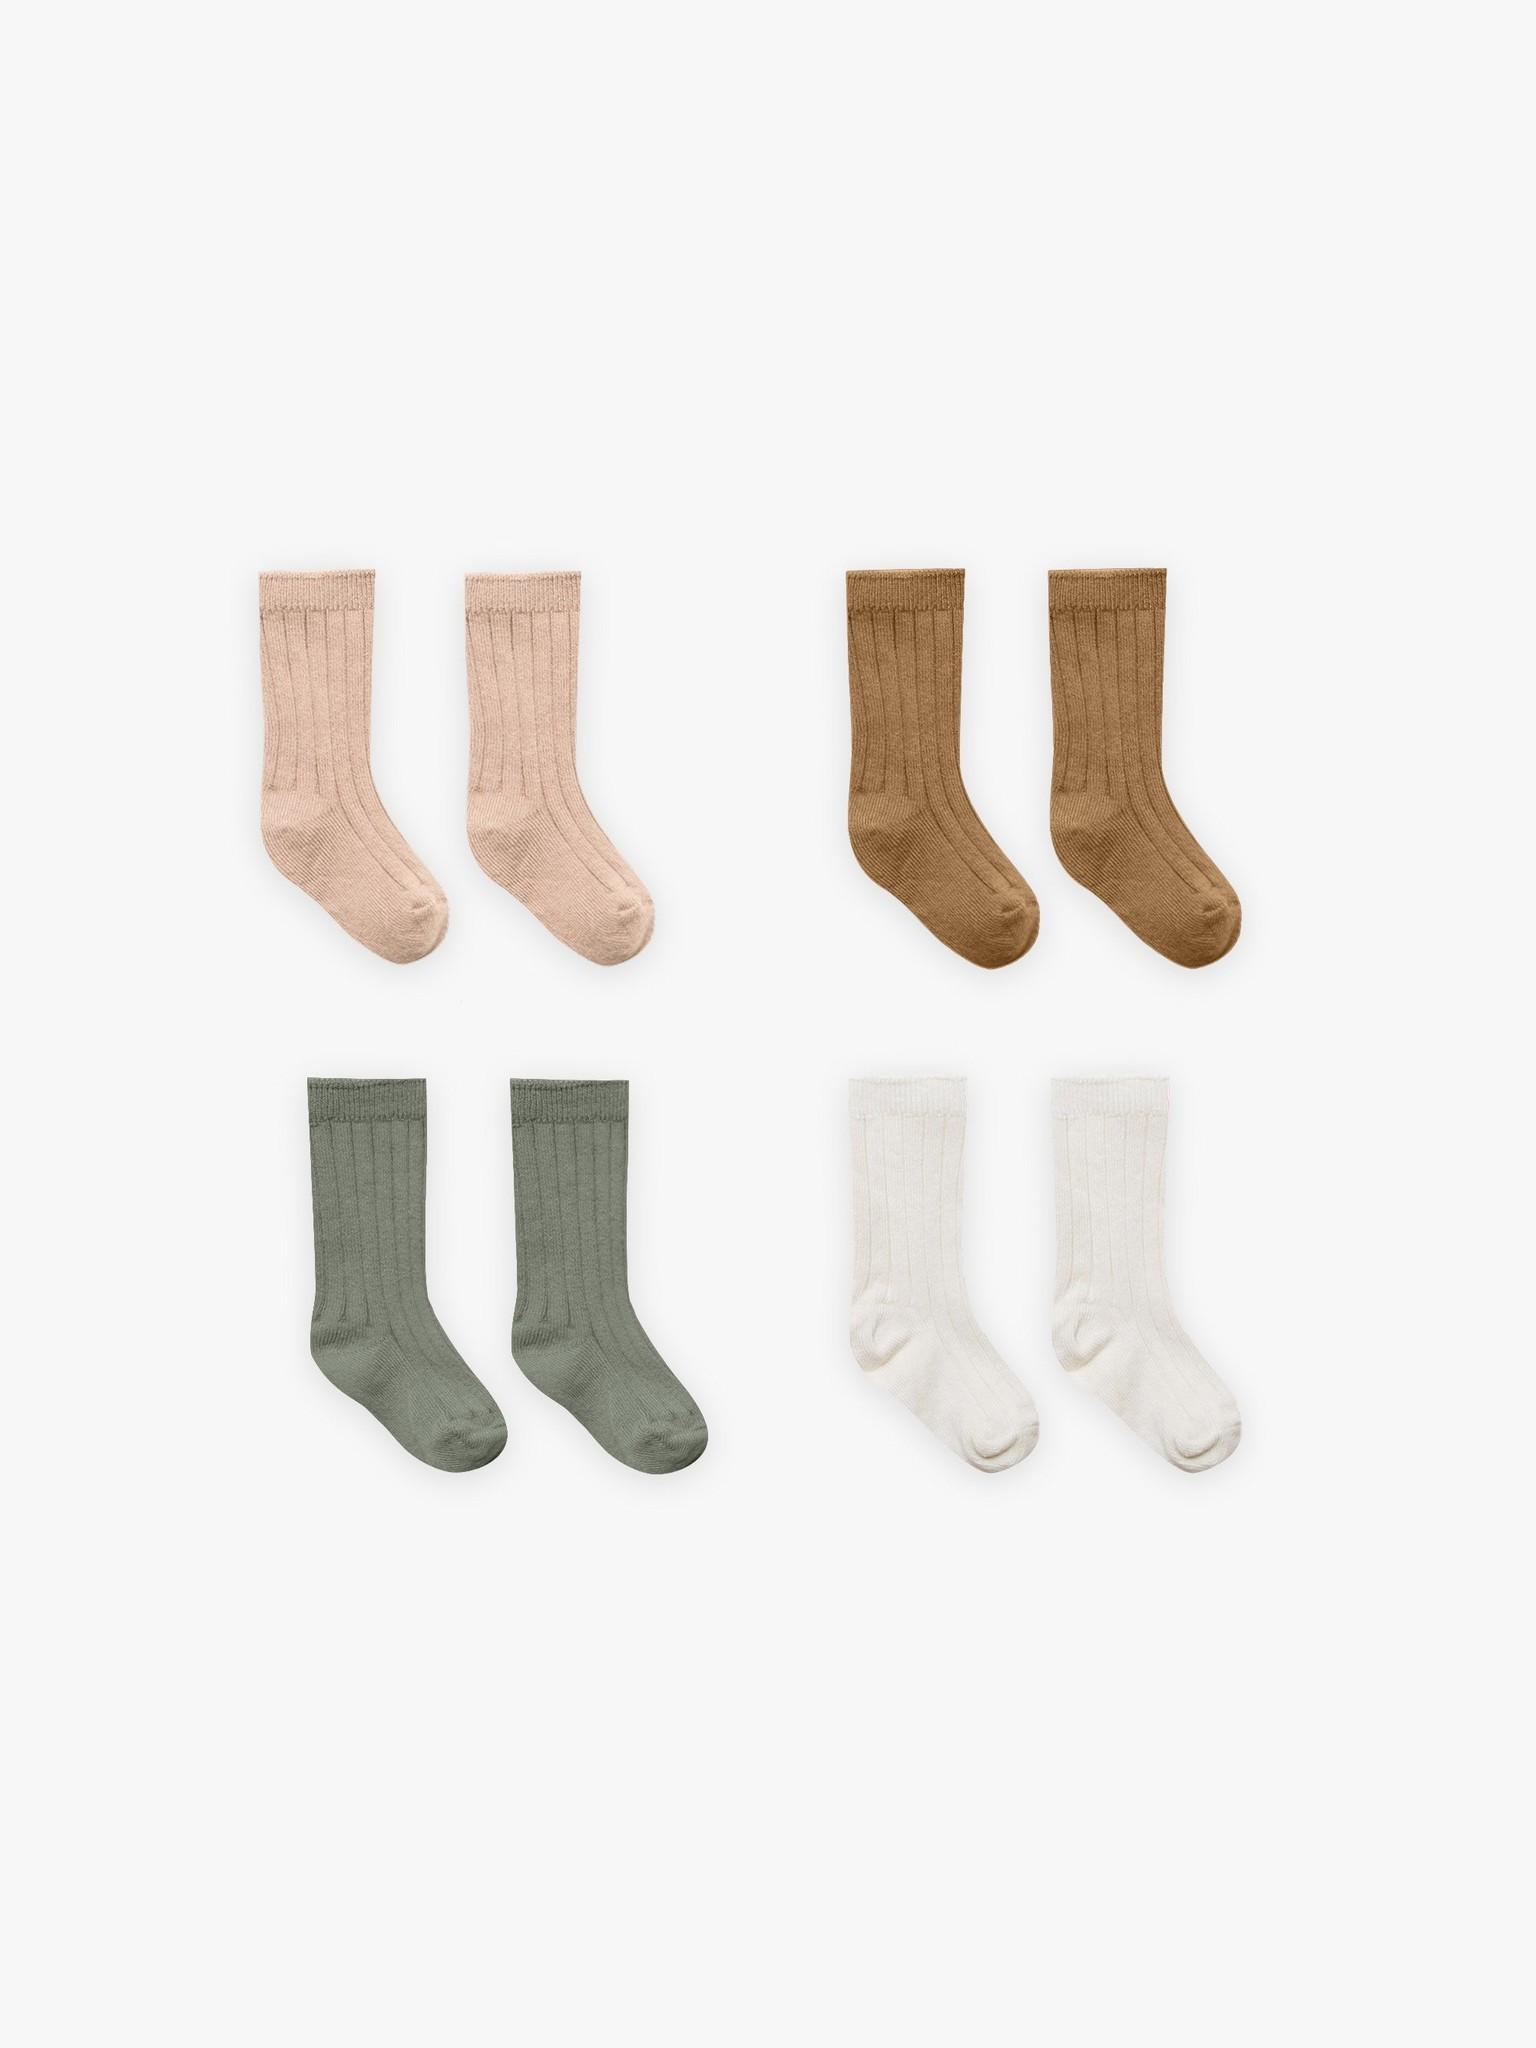 Quincy Mae Quincy Mae Organic  4-Pack Socks - Ivory/Basil/Petal/Walnut